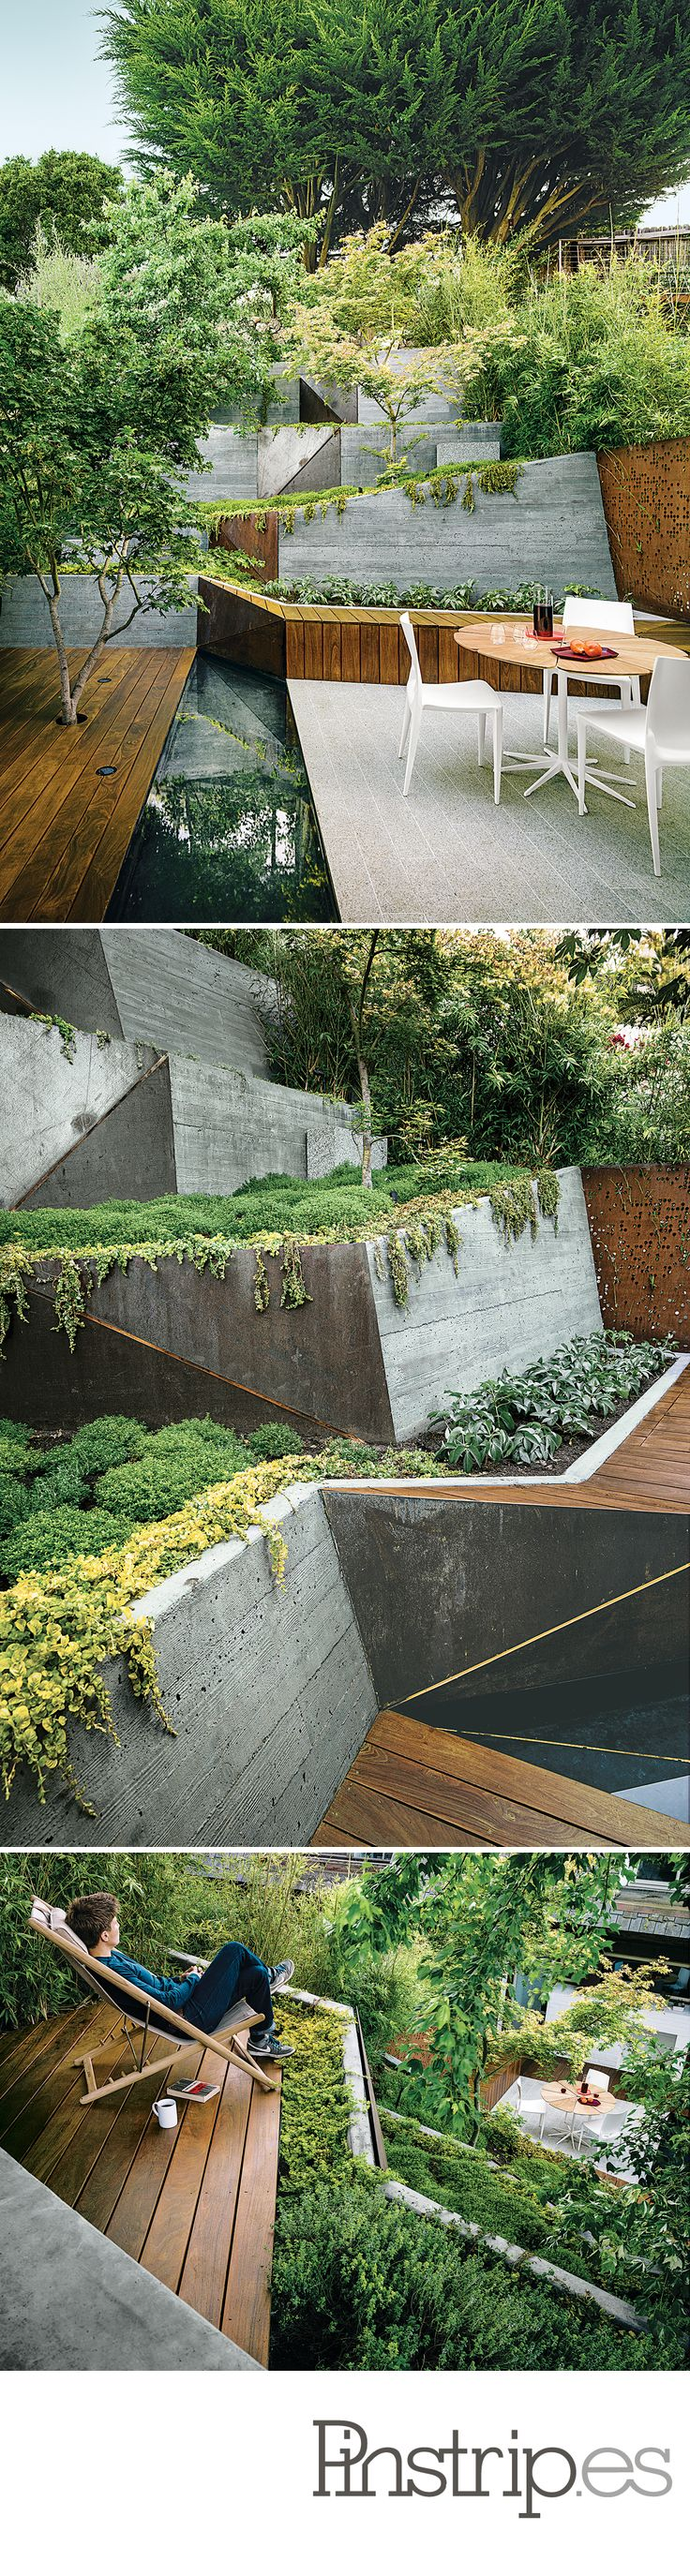 Japanese-inspired landscape design San Francisco. rails, we don't need rails around a deck.